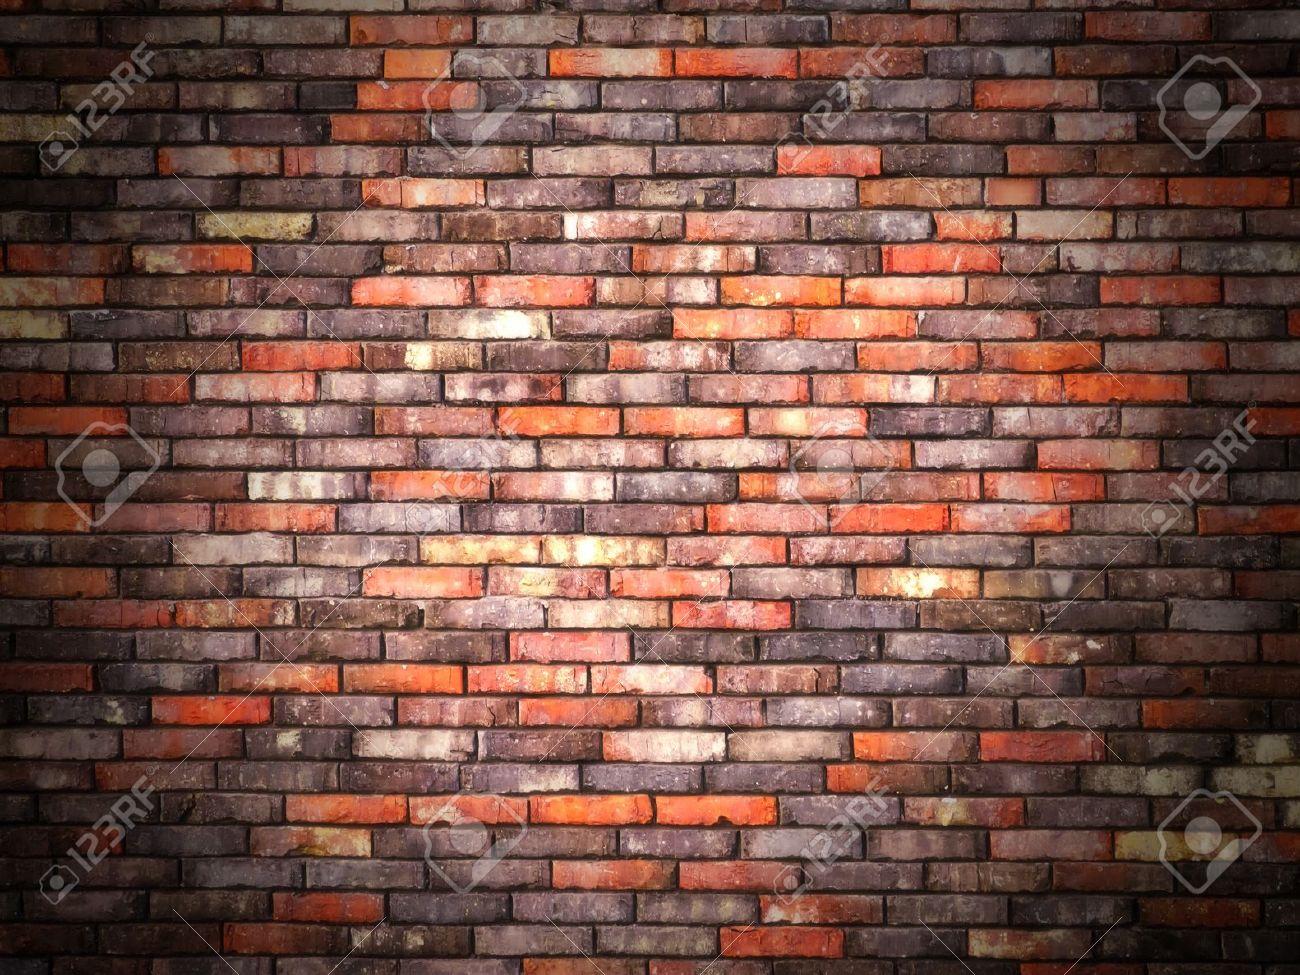 Modern 3d Brick Pattern Wallpaper 30 Distressed Patterns Textures Backgrounds Images